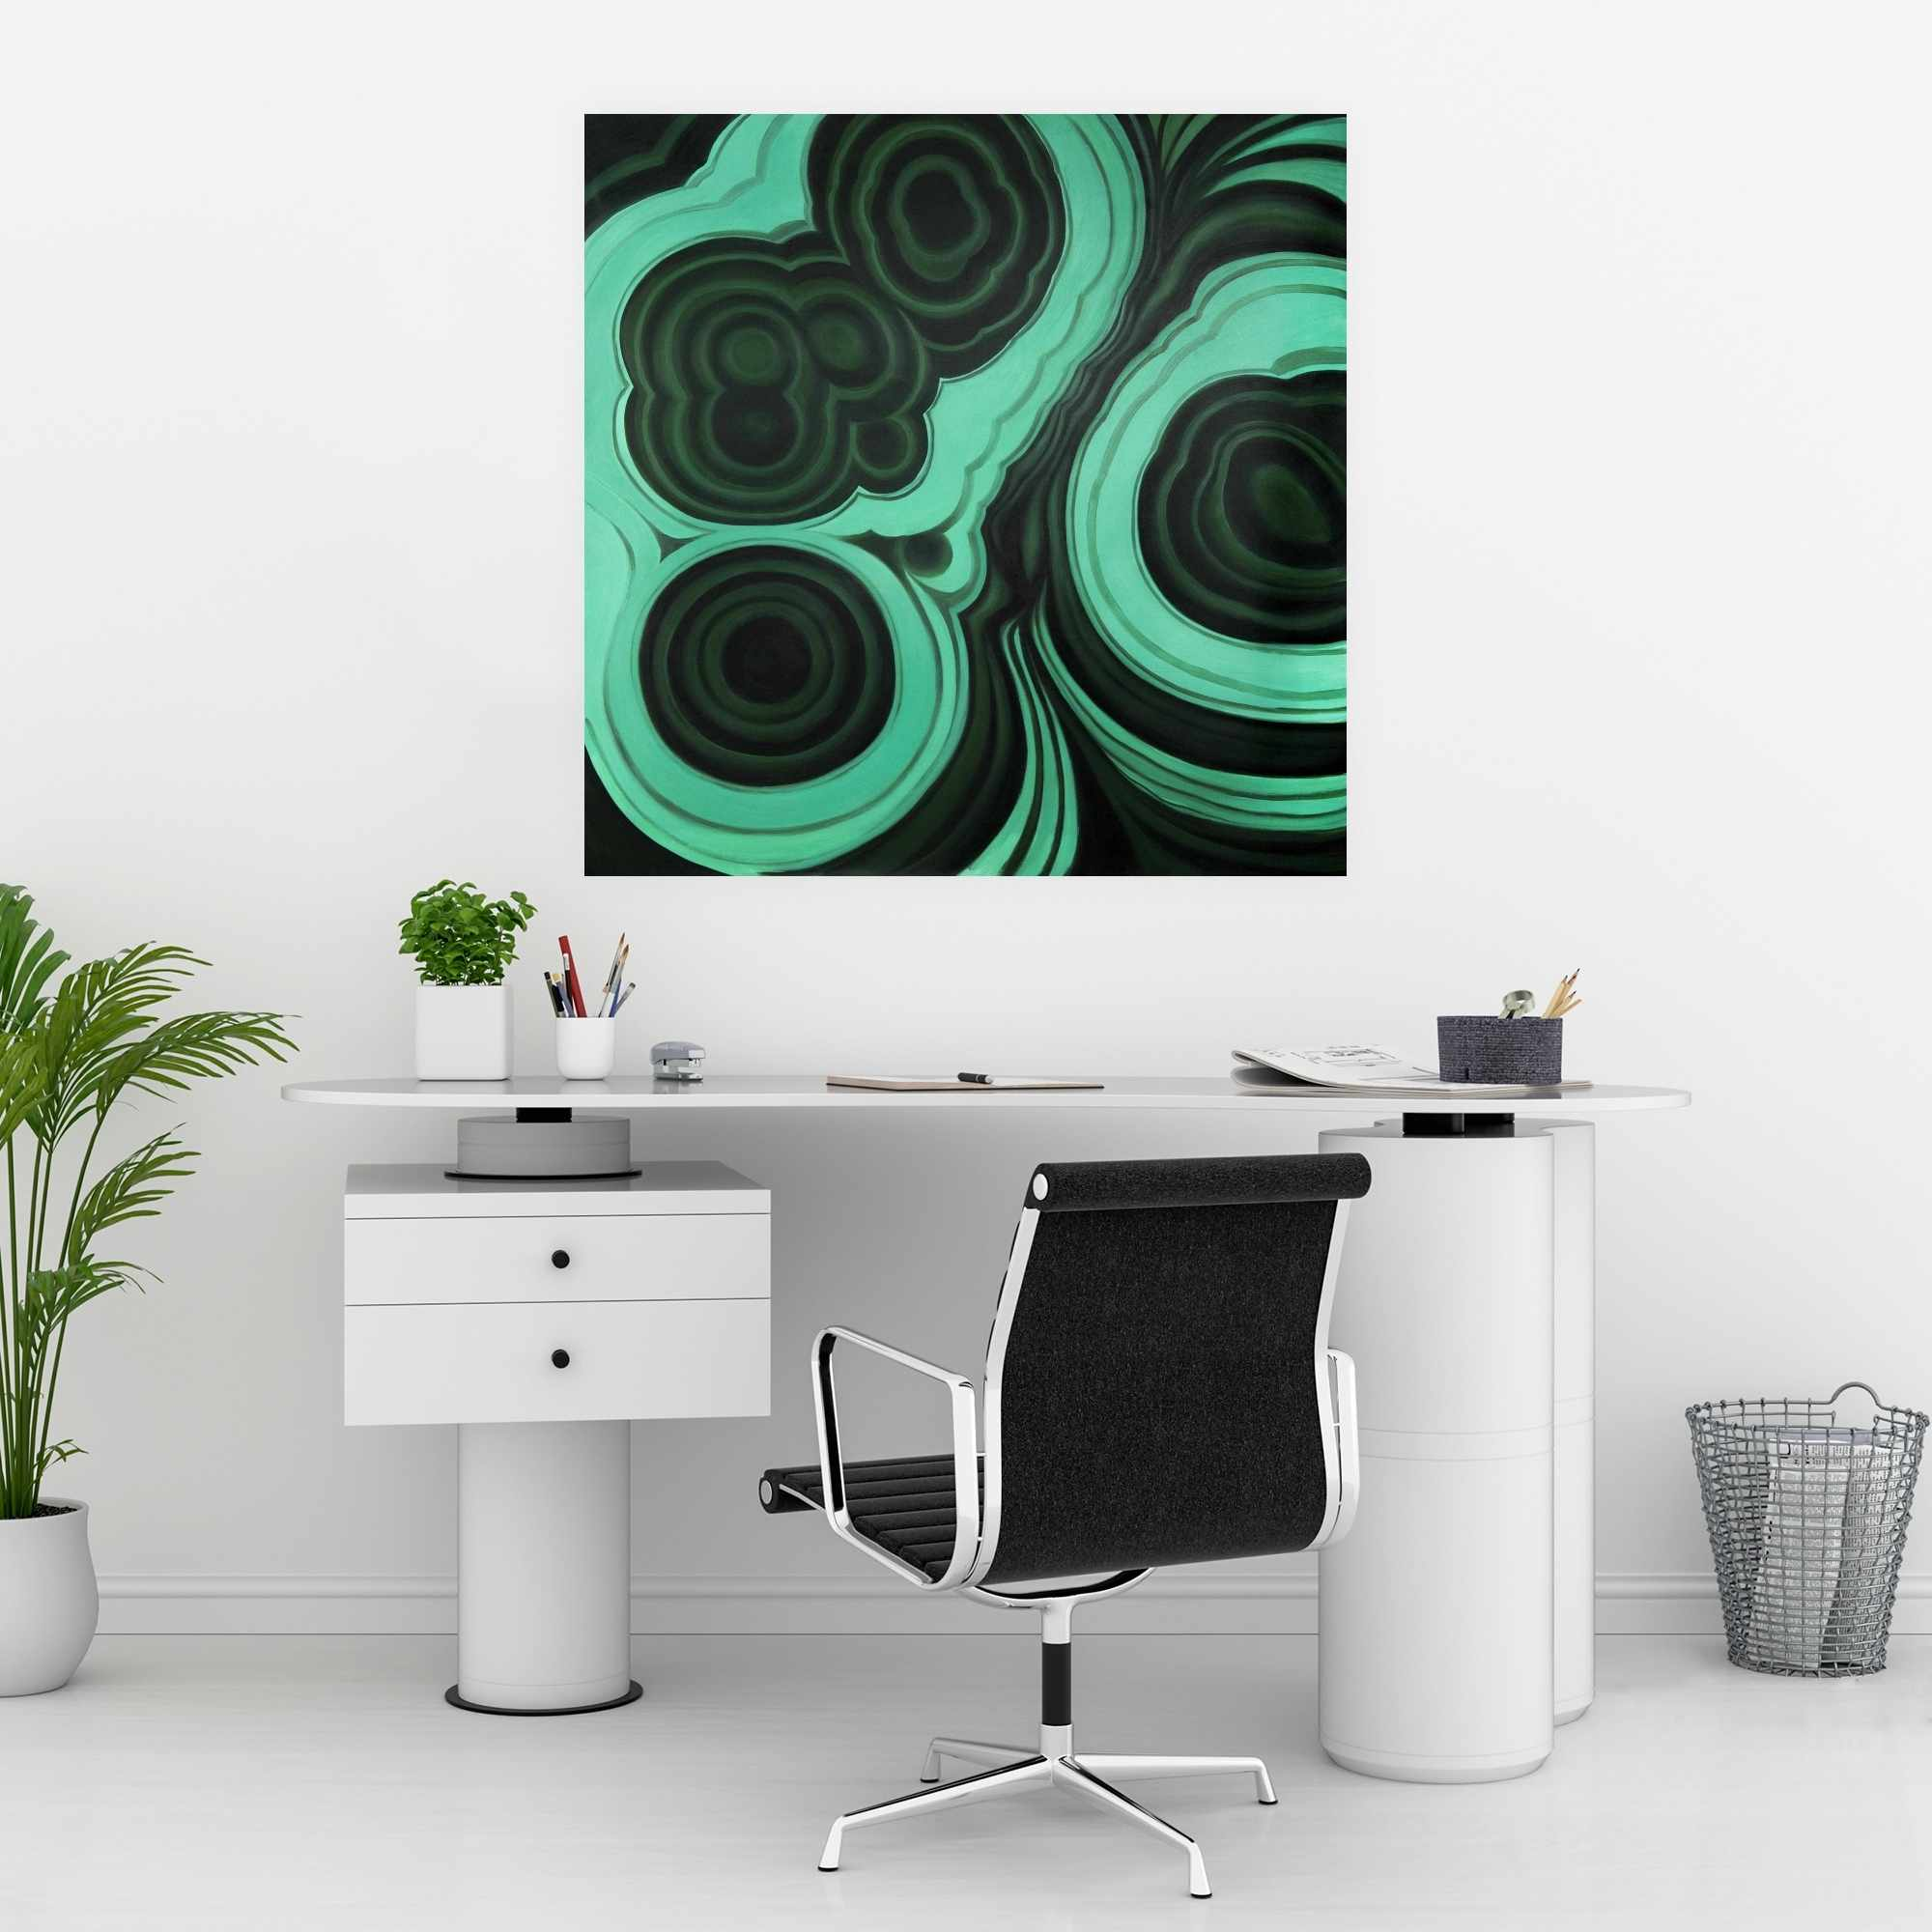 Poster 30 x 30 - Malachite stone